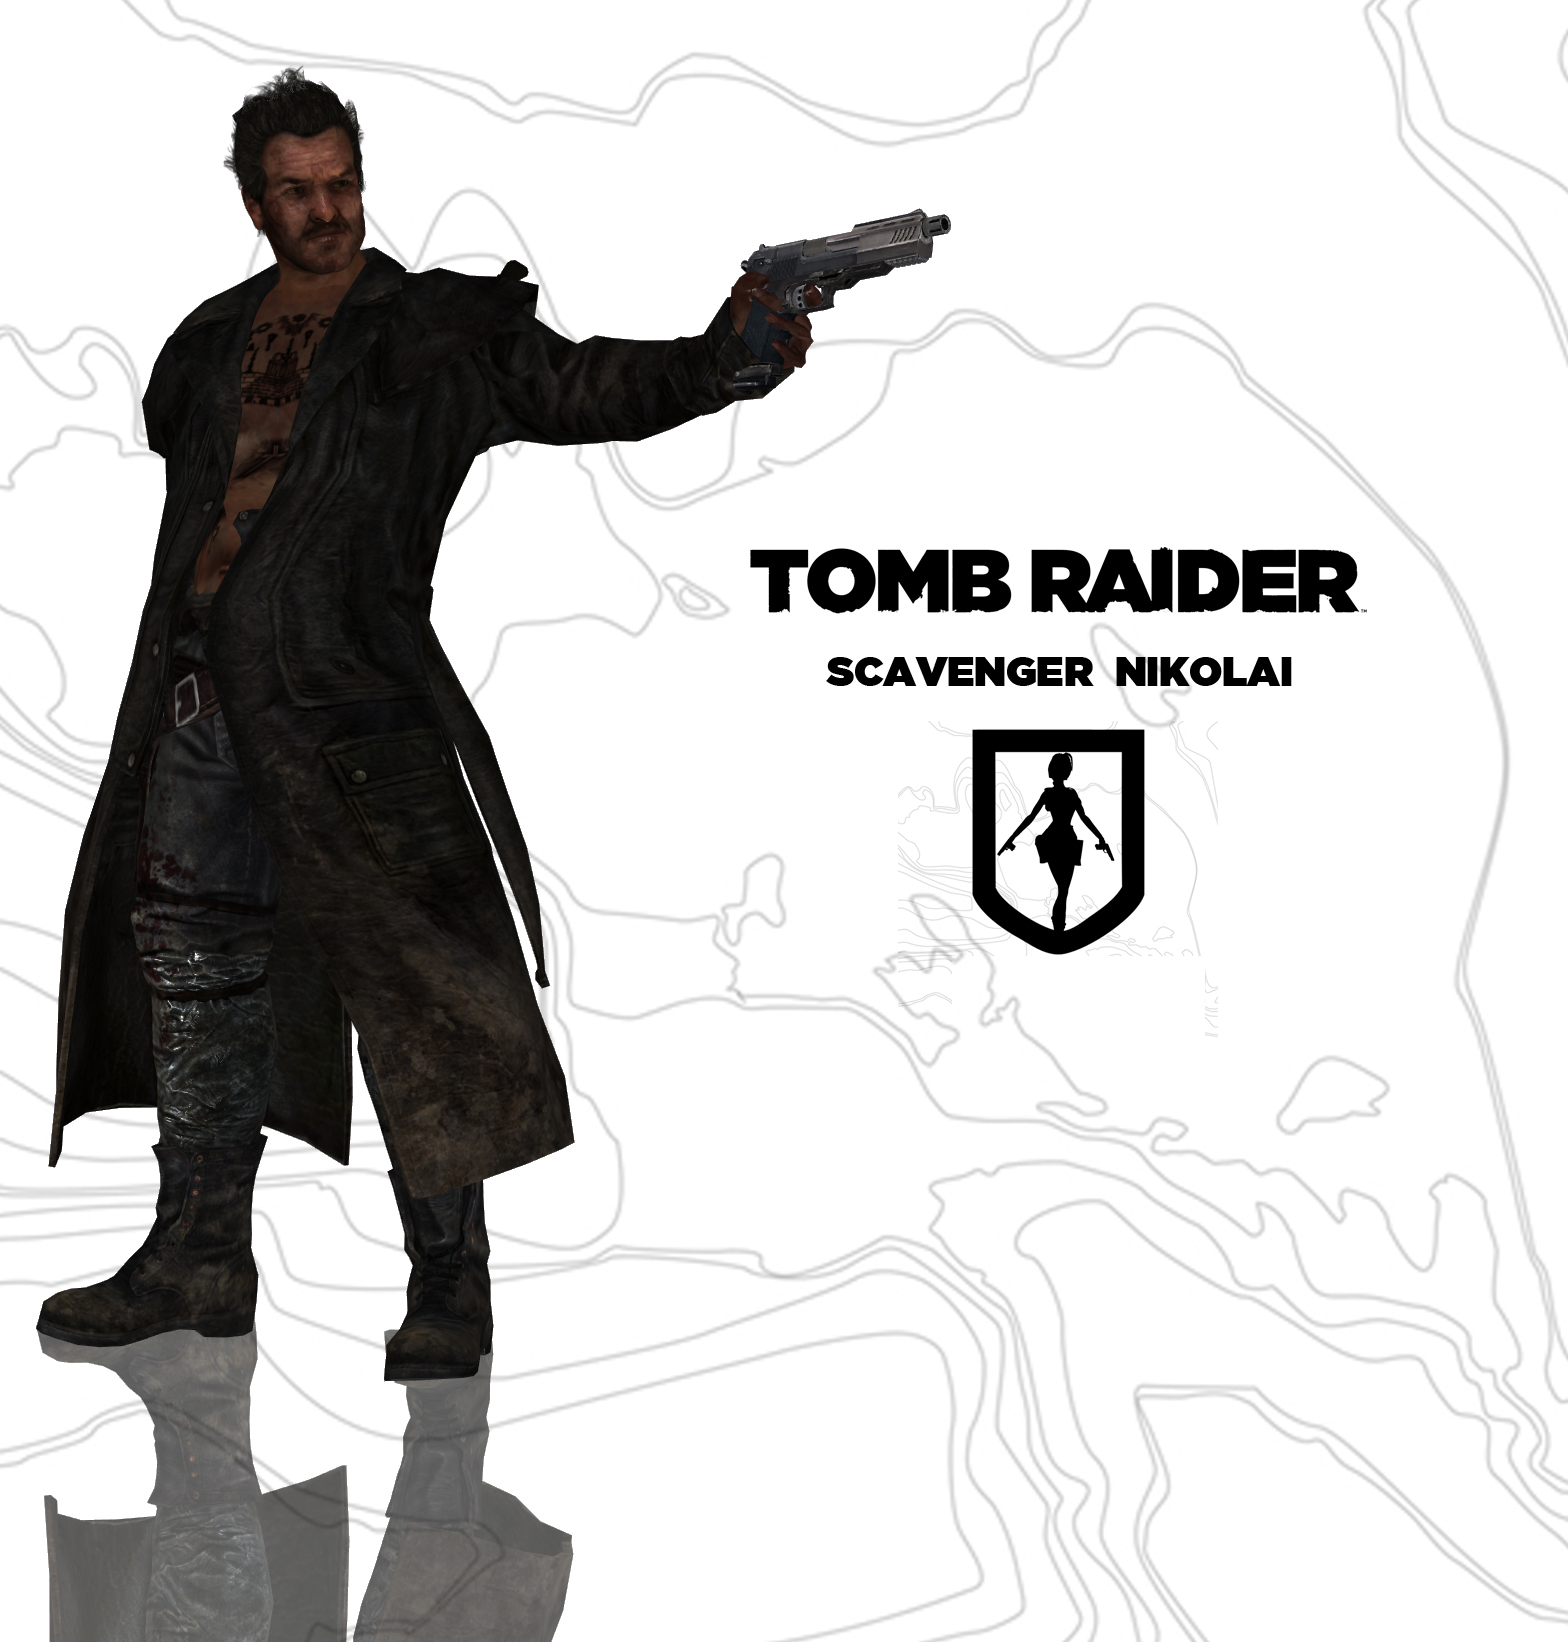 TOMB RAIDER Scavenger Nikolai by doppelstuff